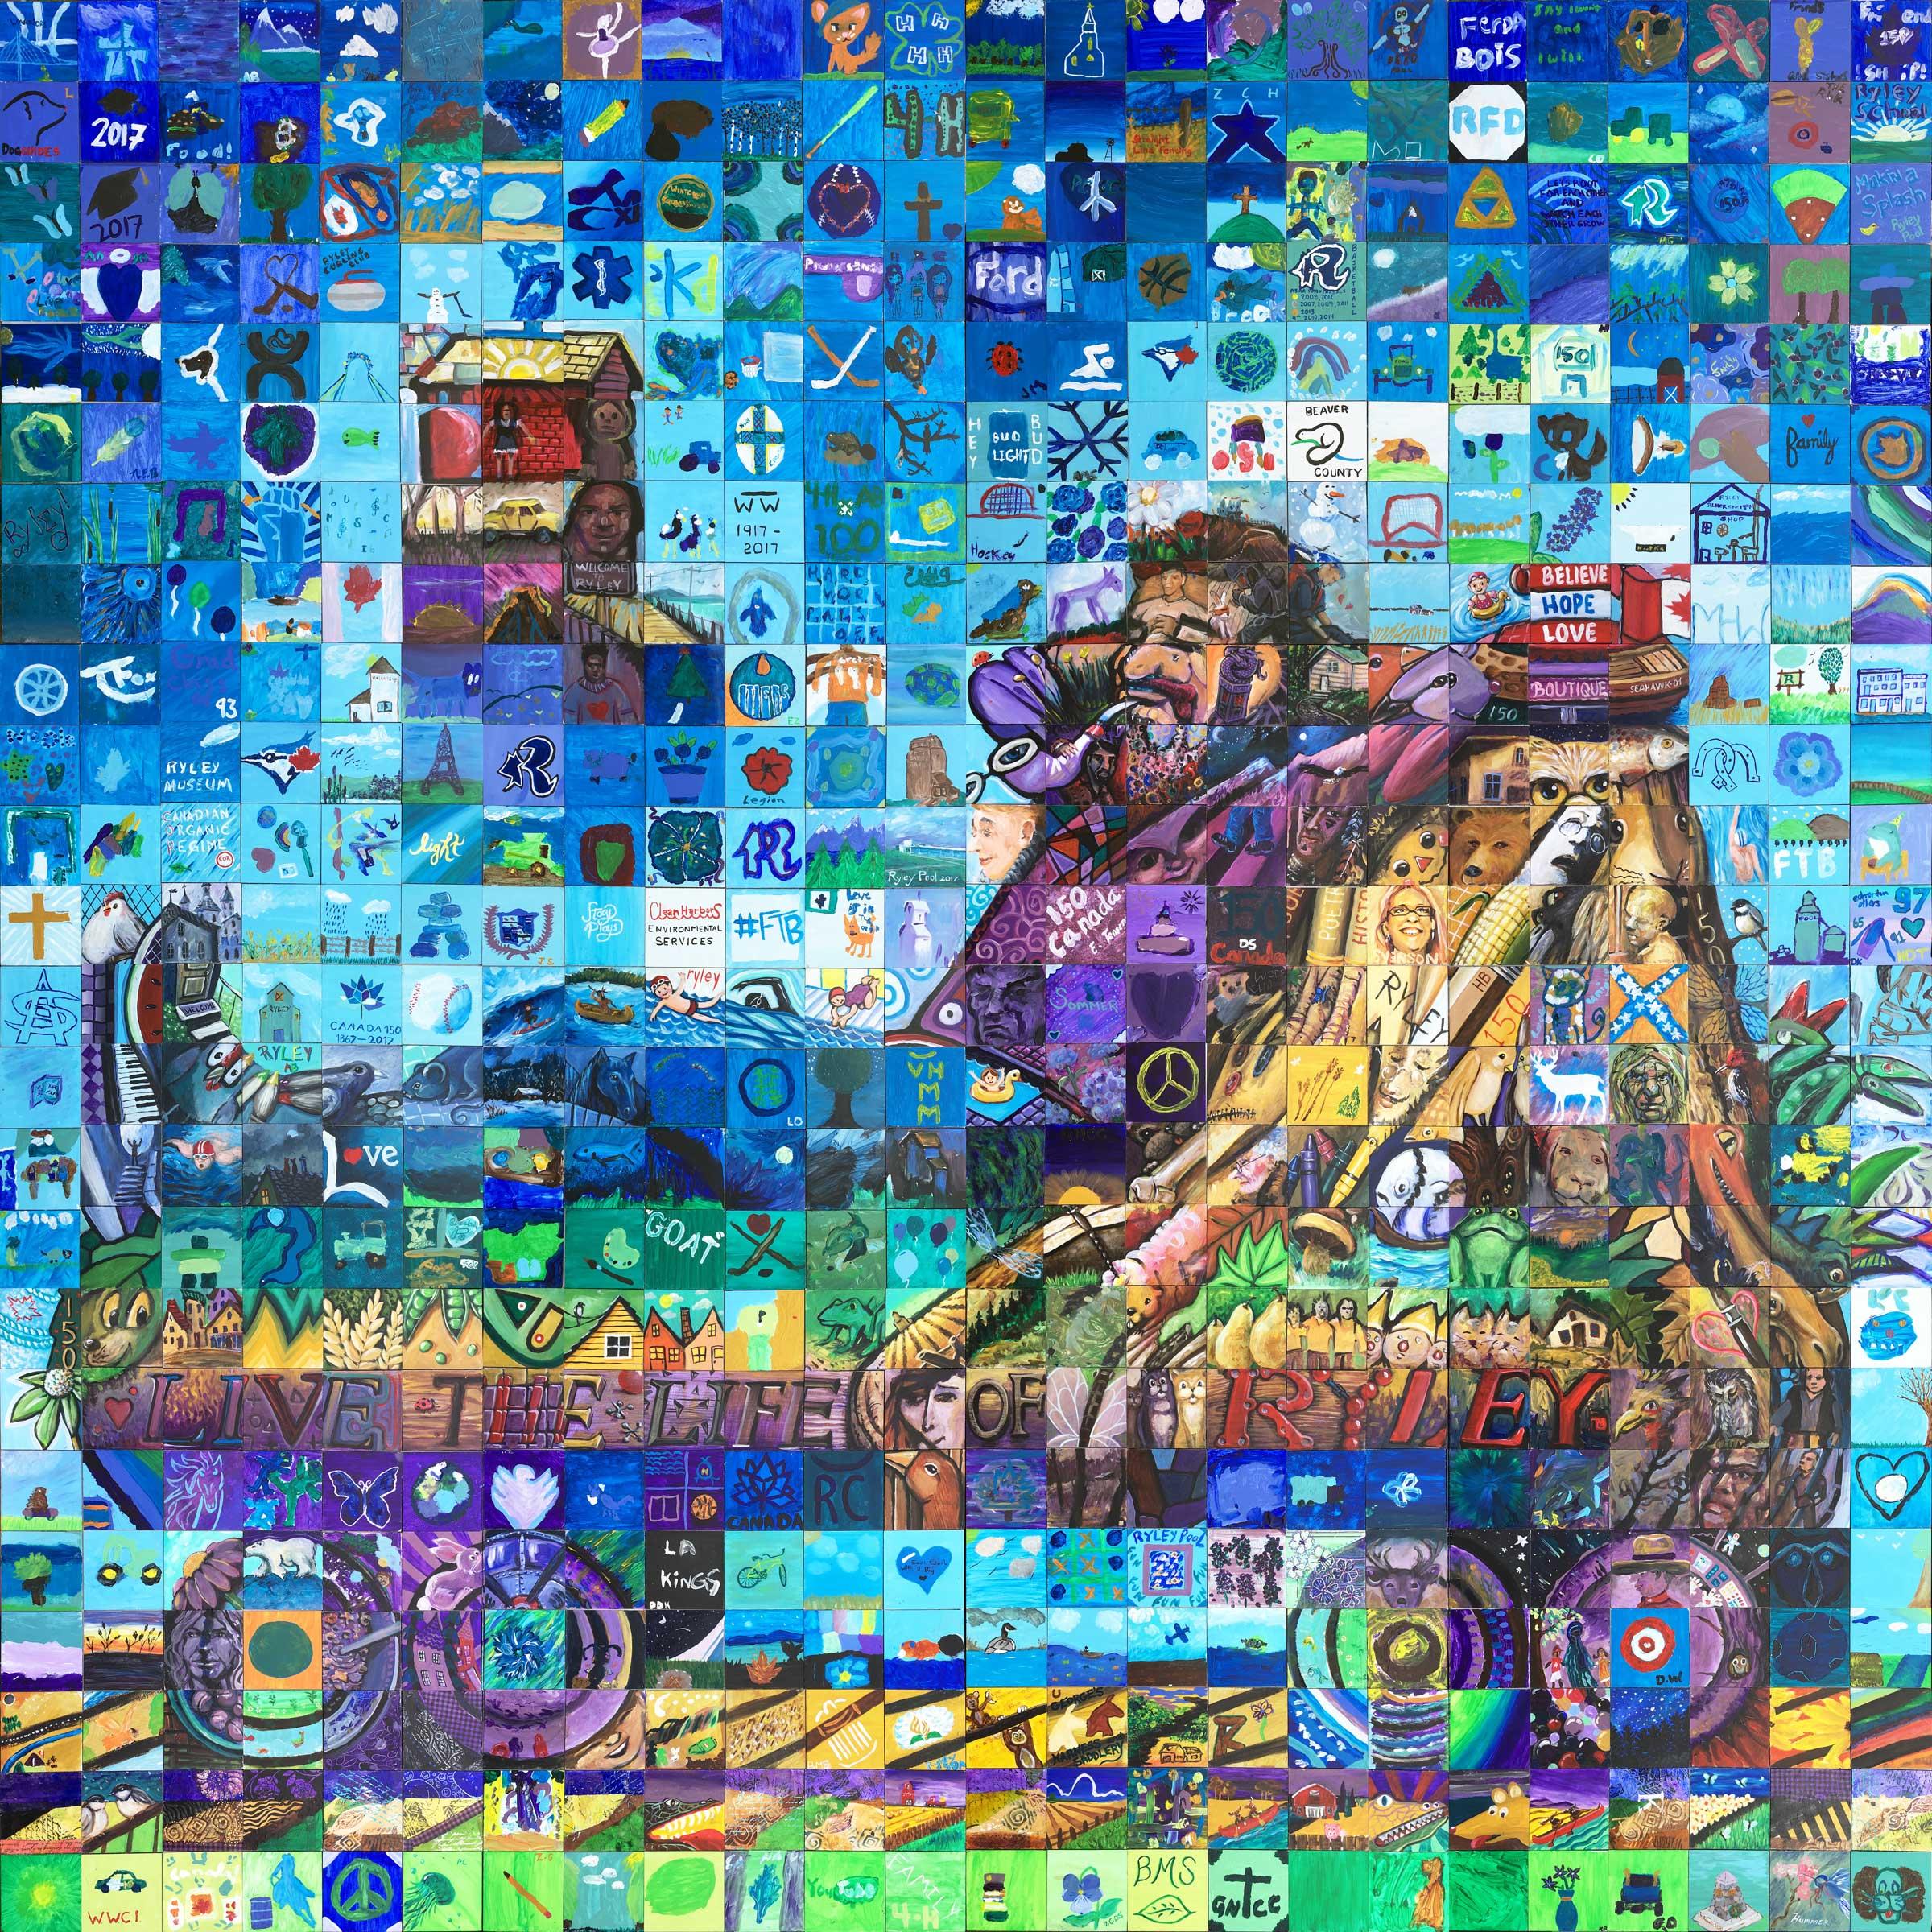 Ryley Alberta Canada 150 Mural